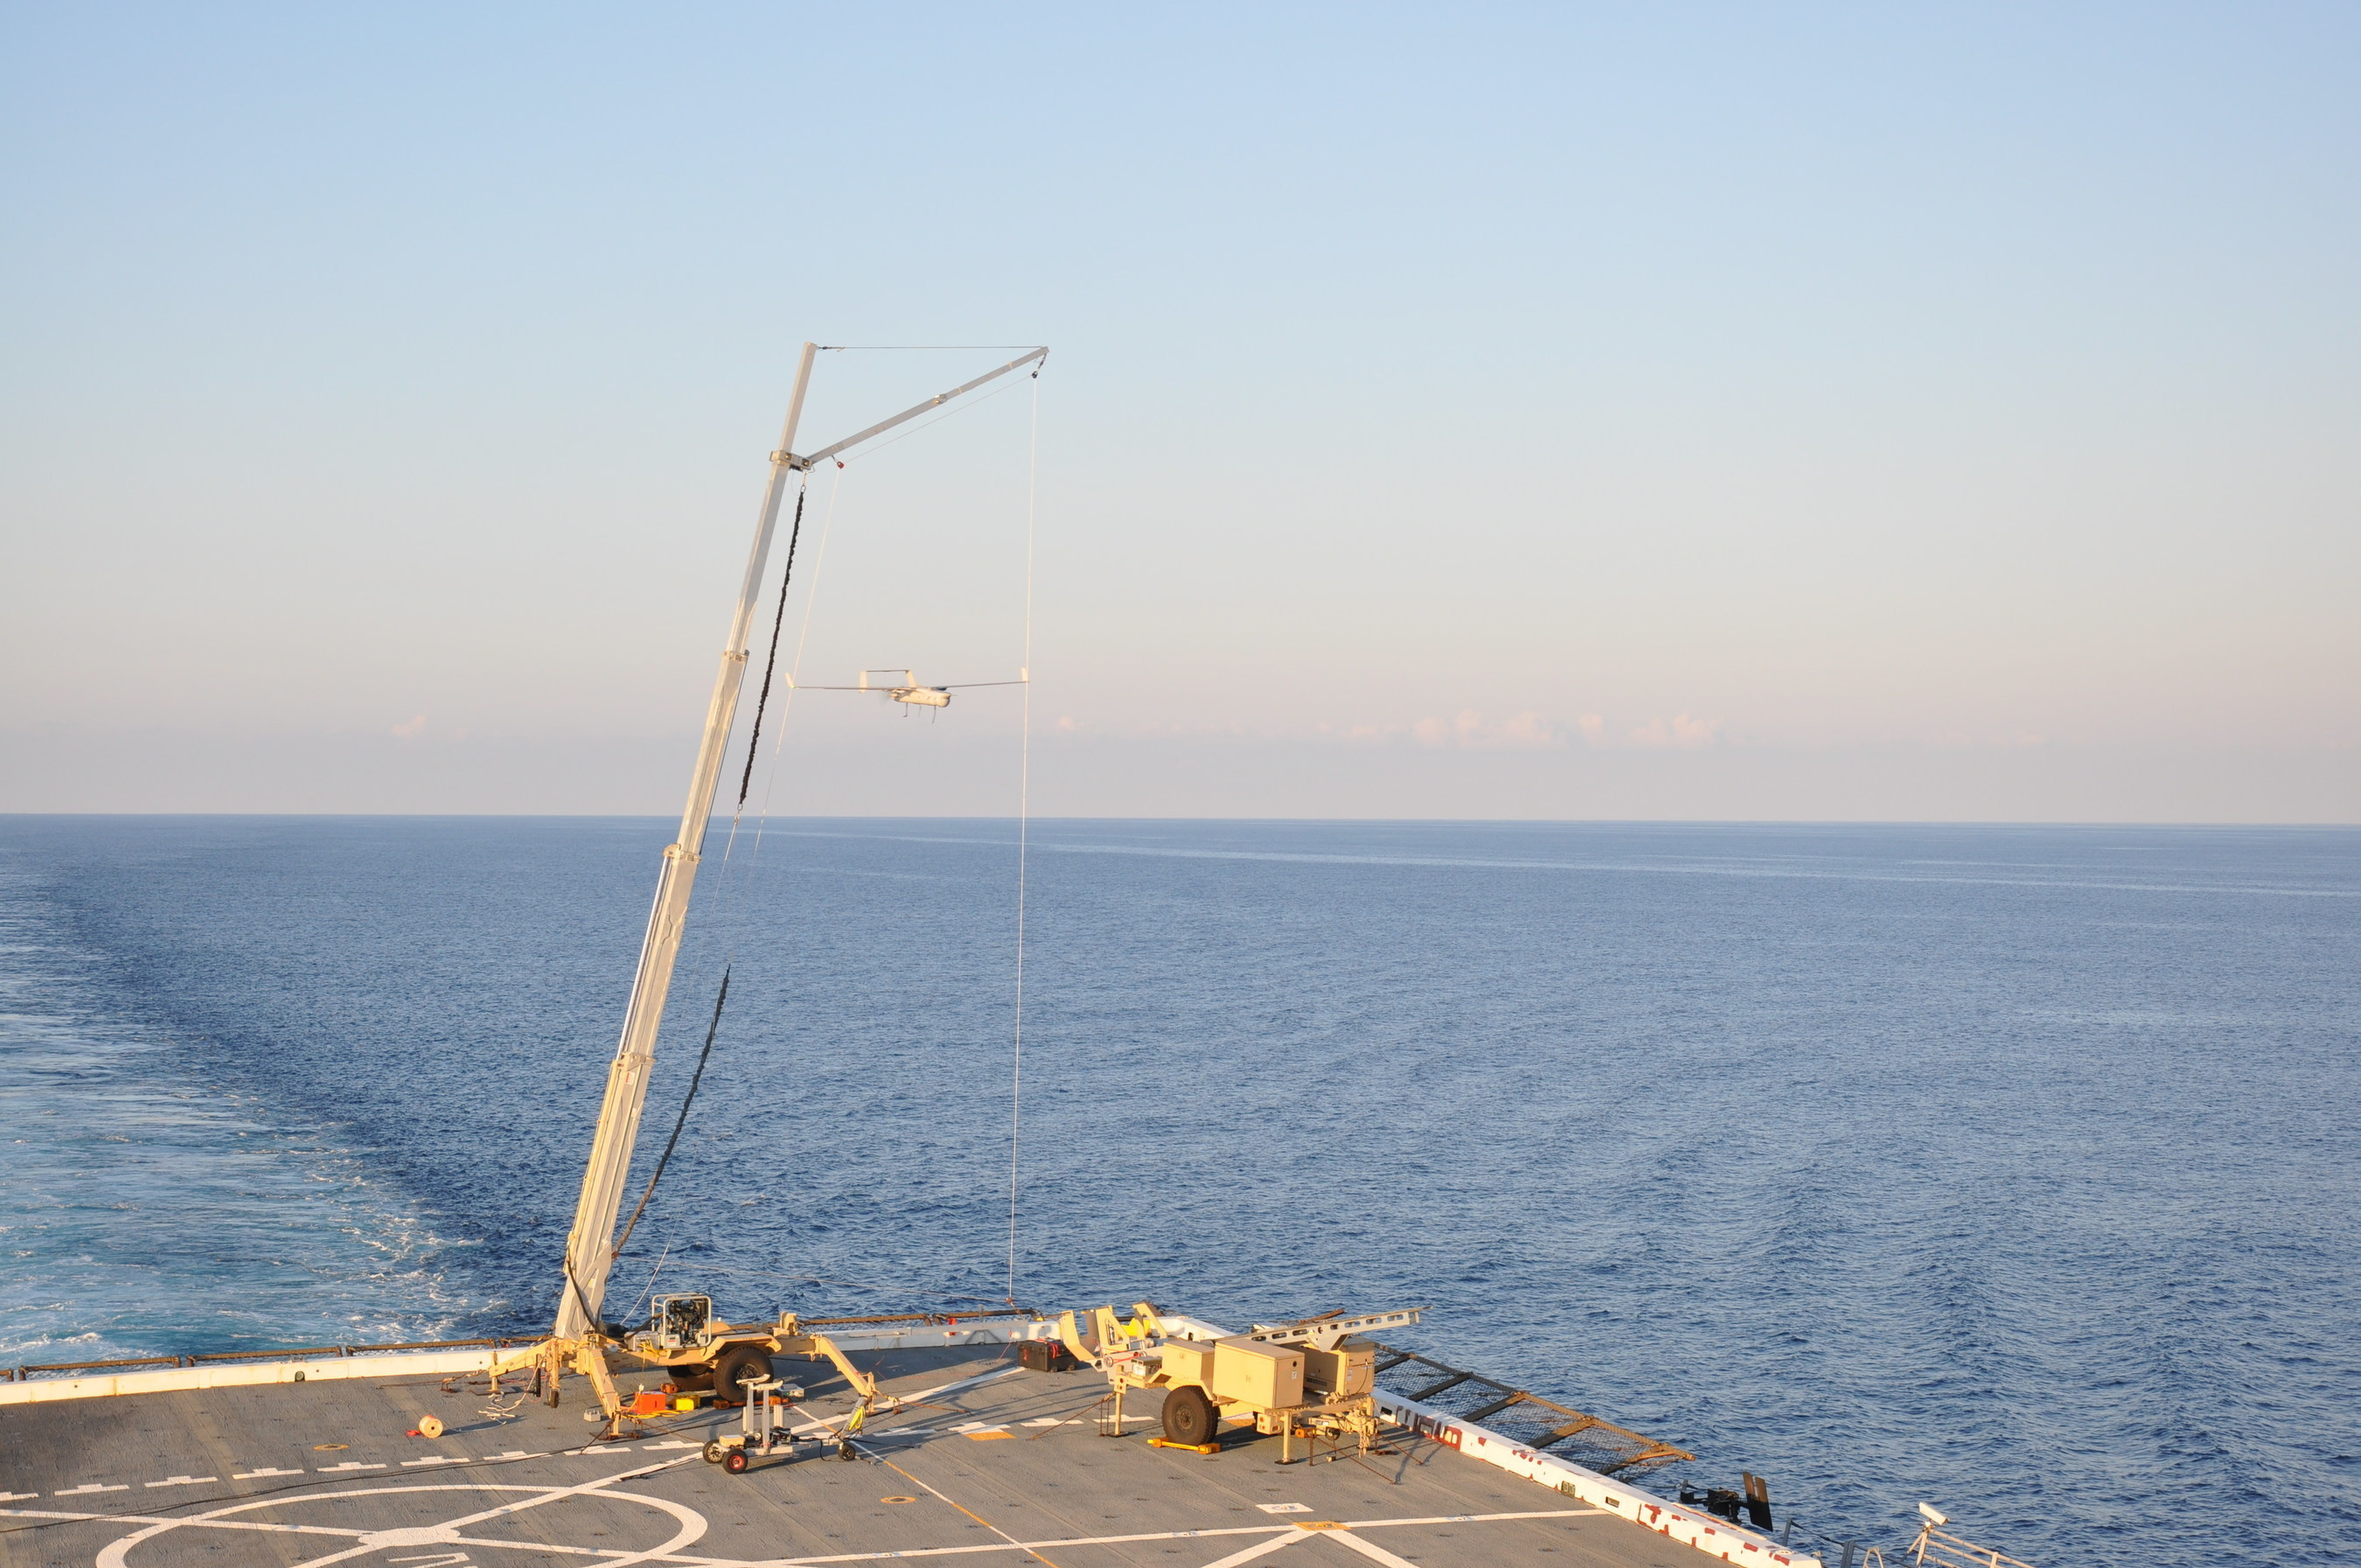 RQ-21A Blackjack recovers aboard the USS Mesa Verde